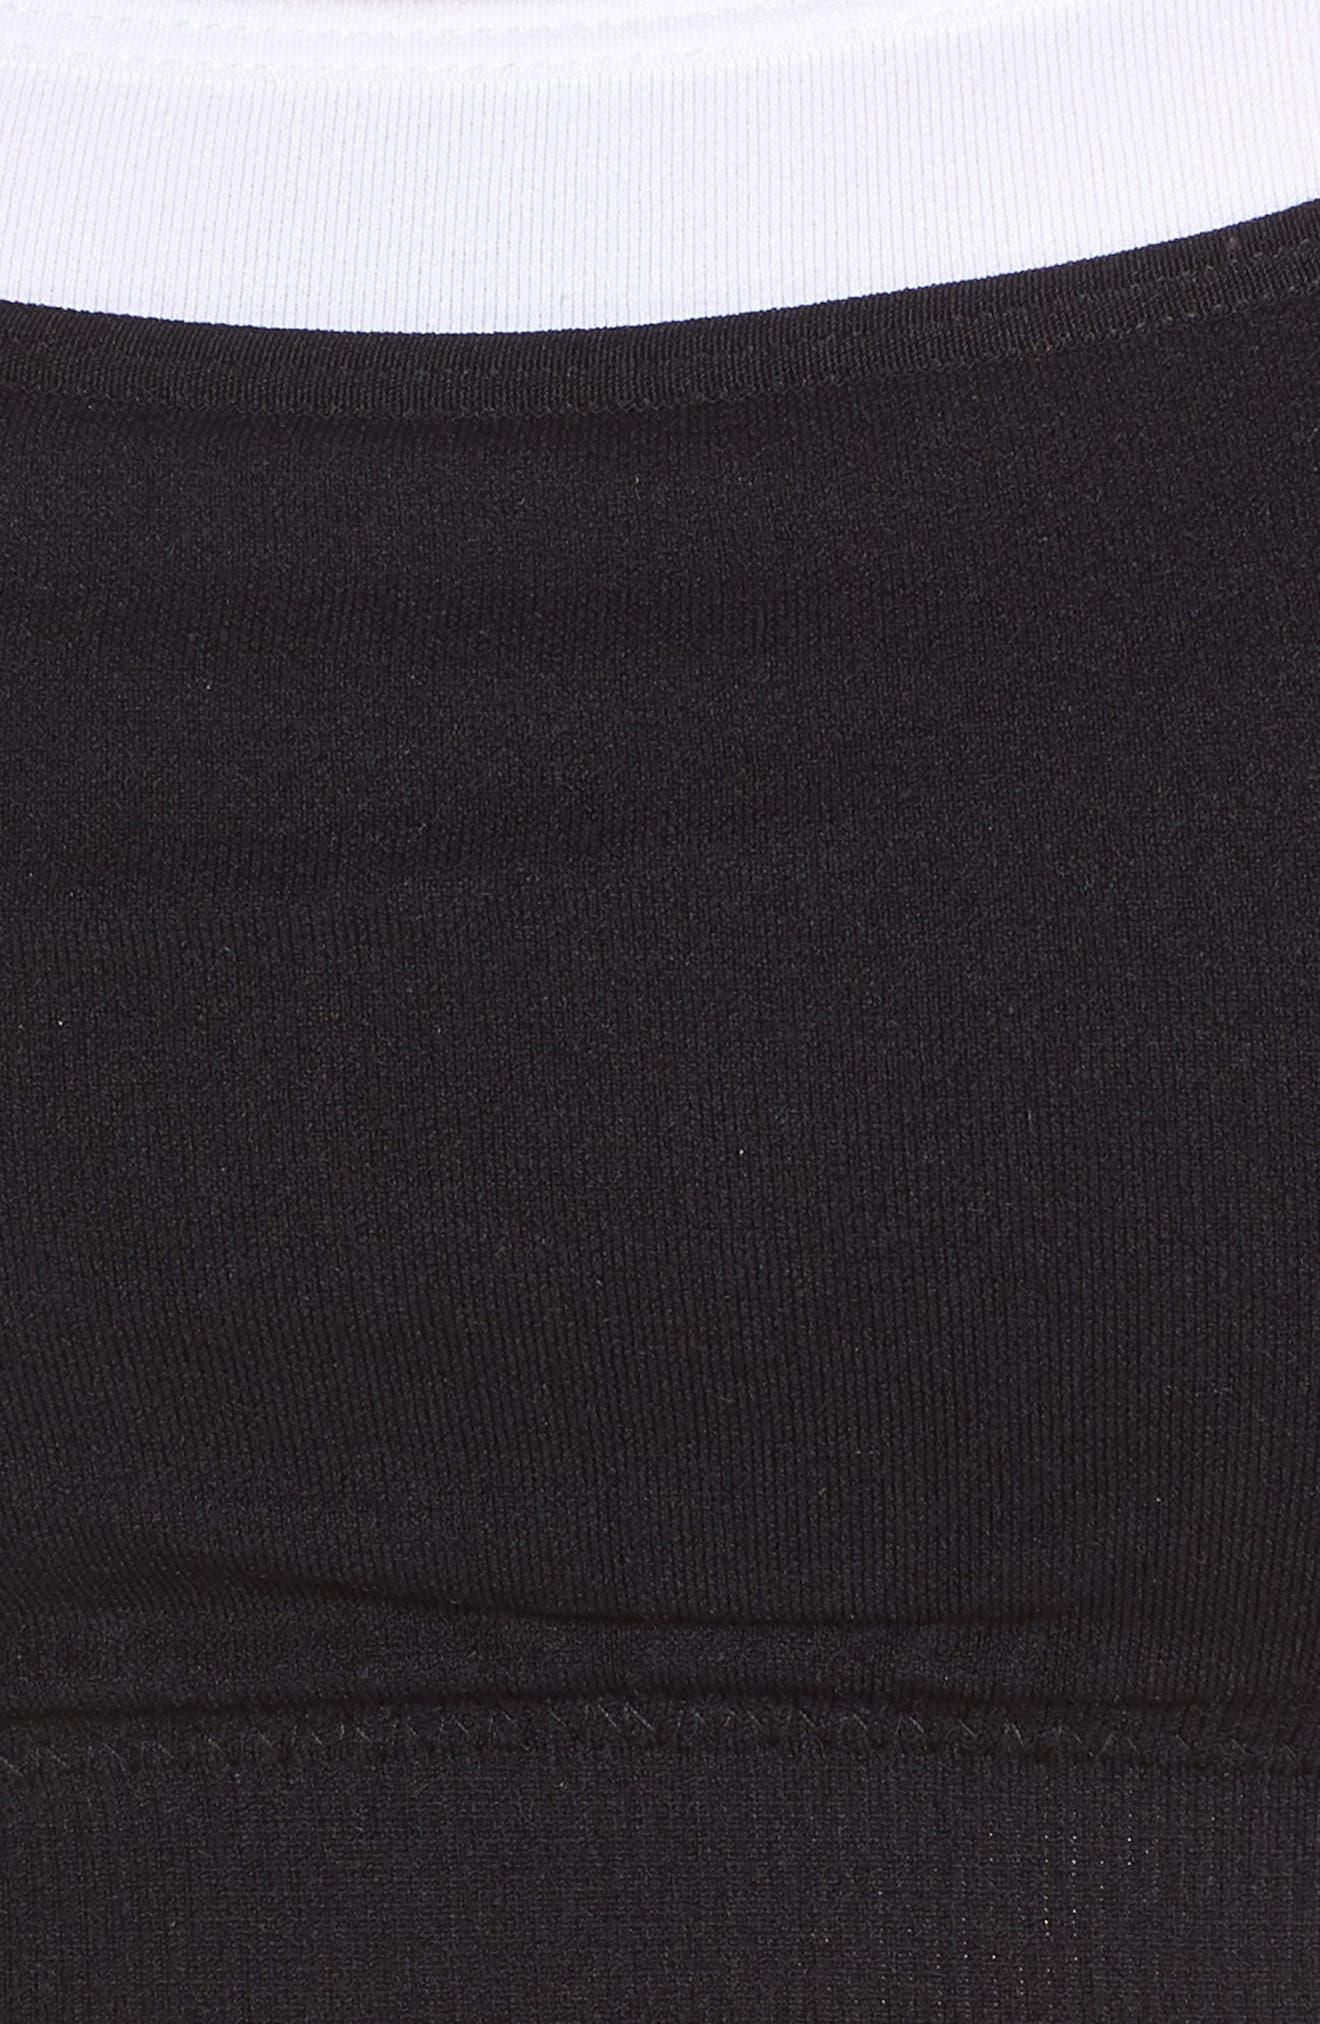 Caroline Seamless Layered Sports Bra,                             Alternate thumbnail 6, color,                             Black/ White